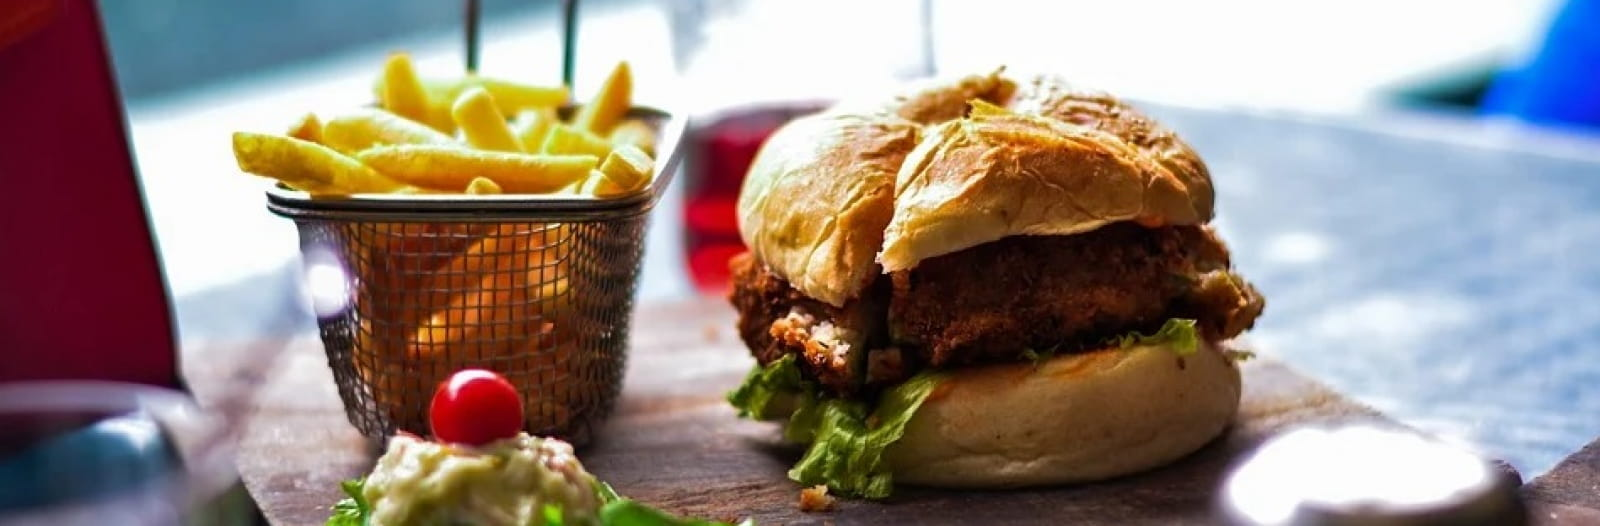 Plat burger / frites